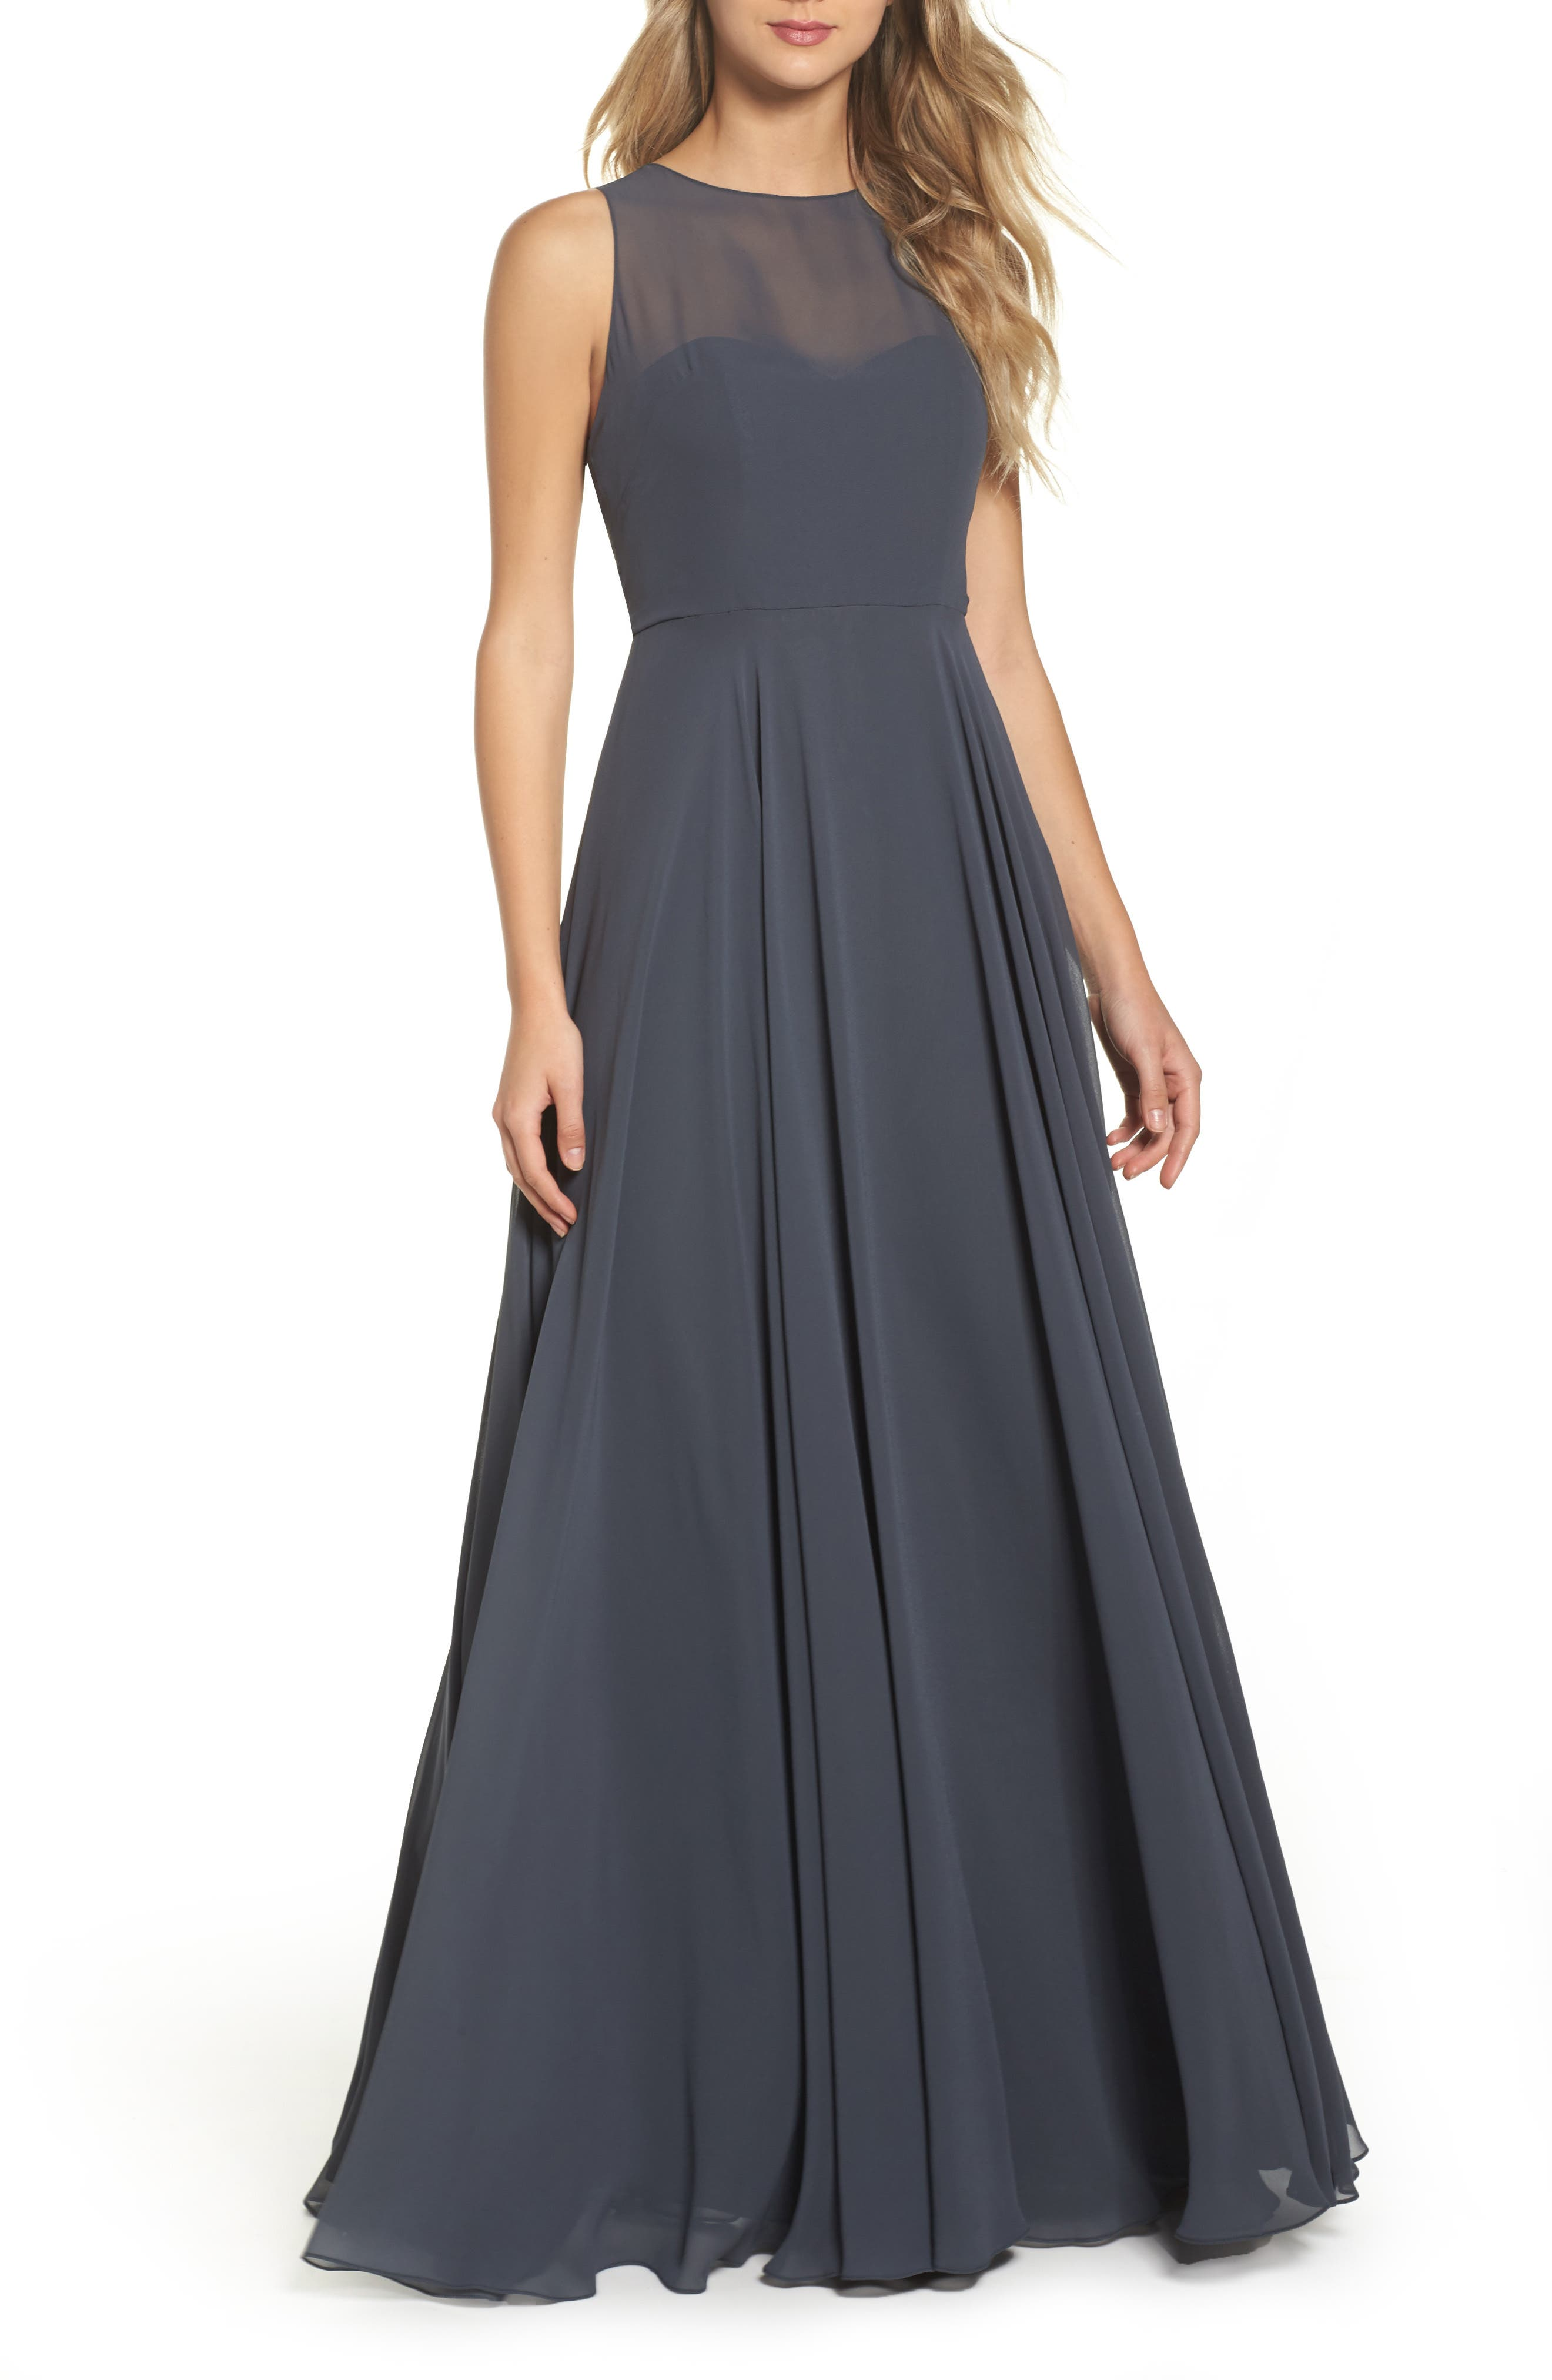 Elizabeth Chiffon Gown,                         Main,                         color, 026